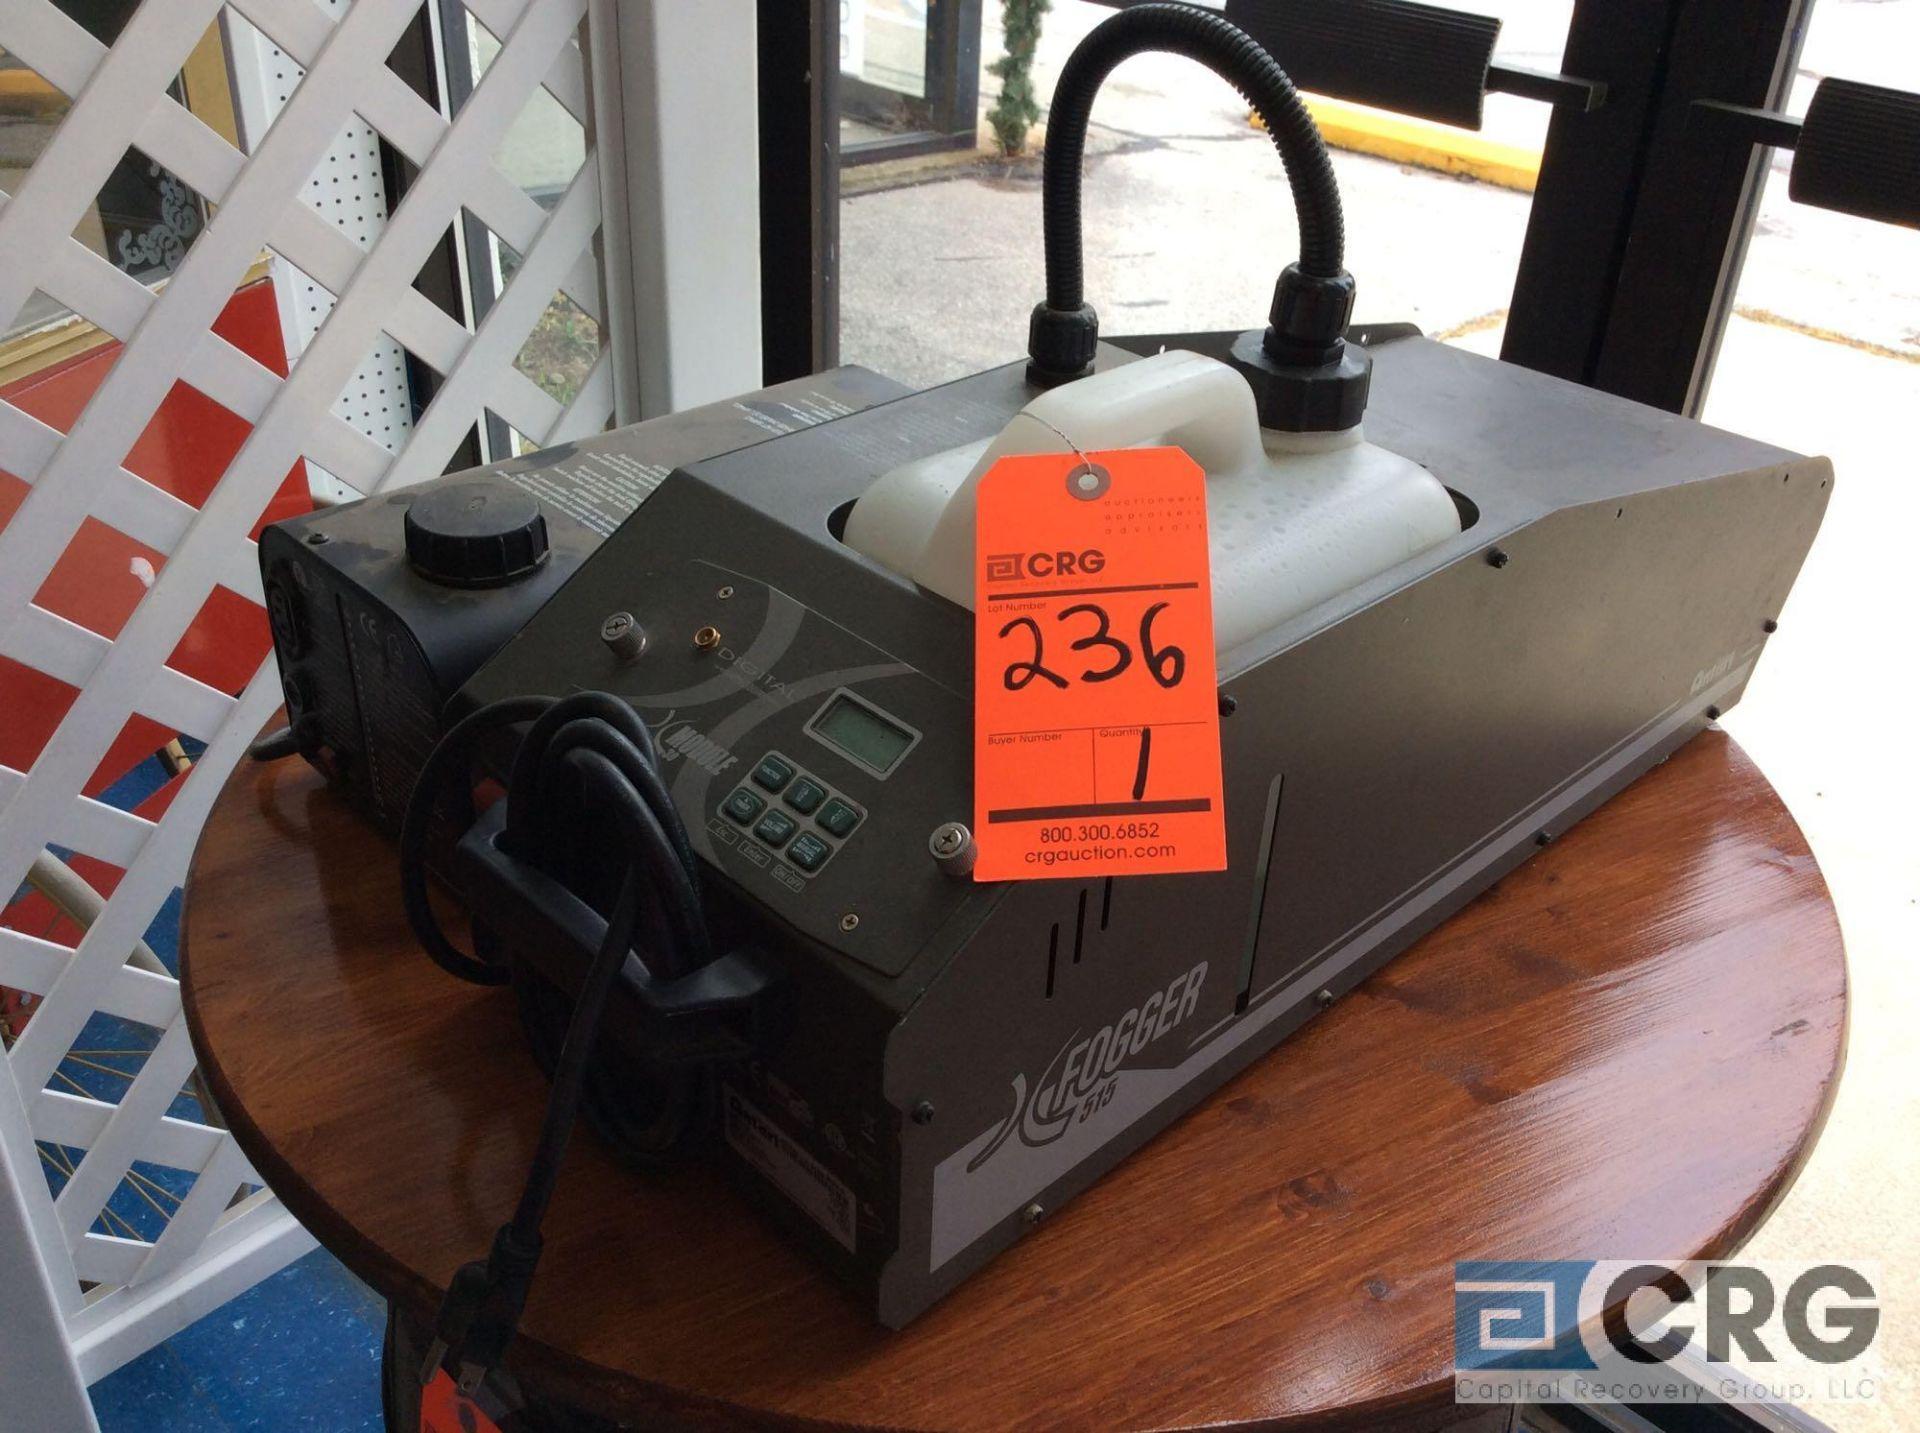 Lot 236 - Lot consists of (2) portable foggers, (1) Antari 515, (1) fog-700